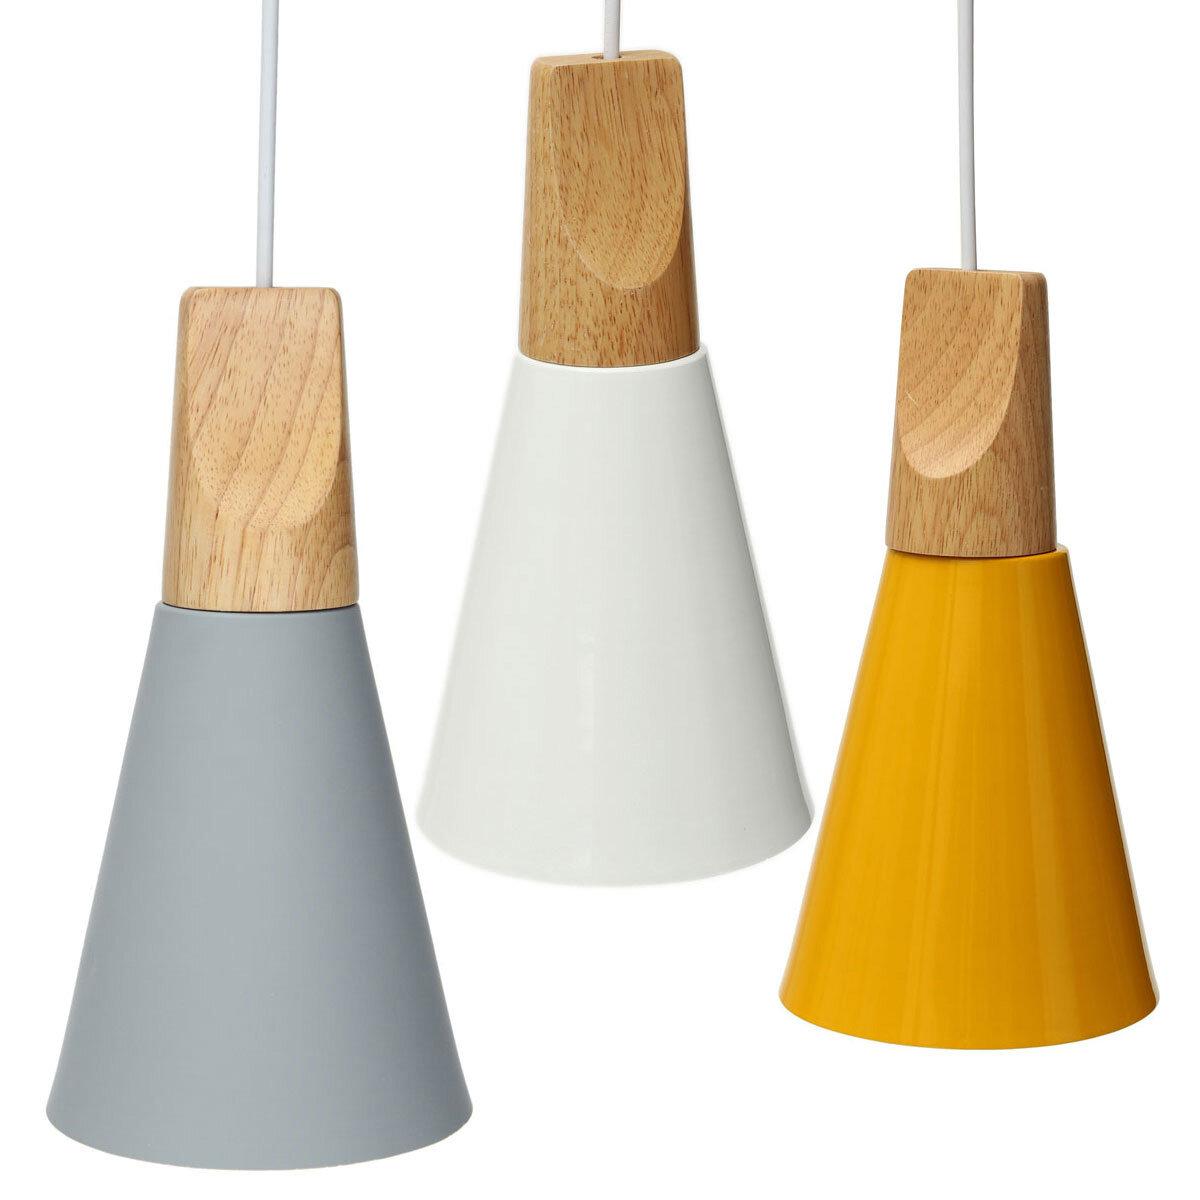 Vintage Wooden European Style Lampshade Pendant Lamp Aluminum Ceiling Light Shades Cod